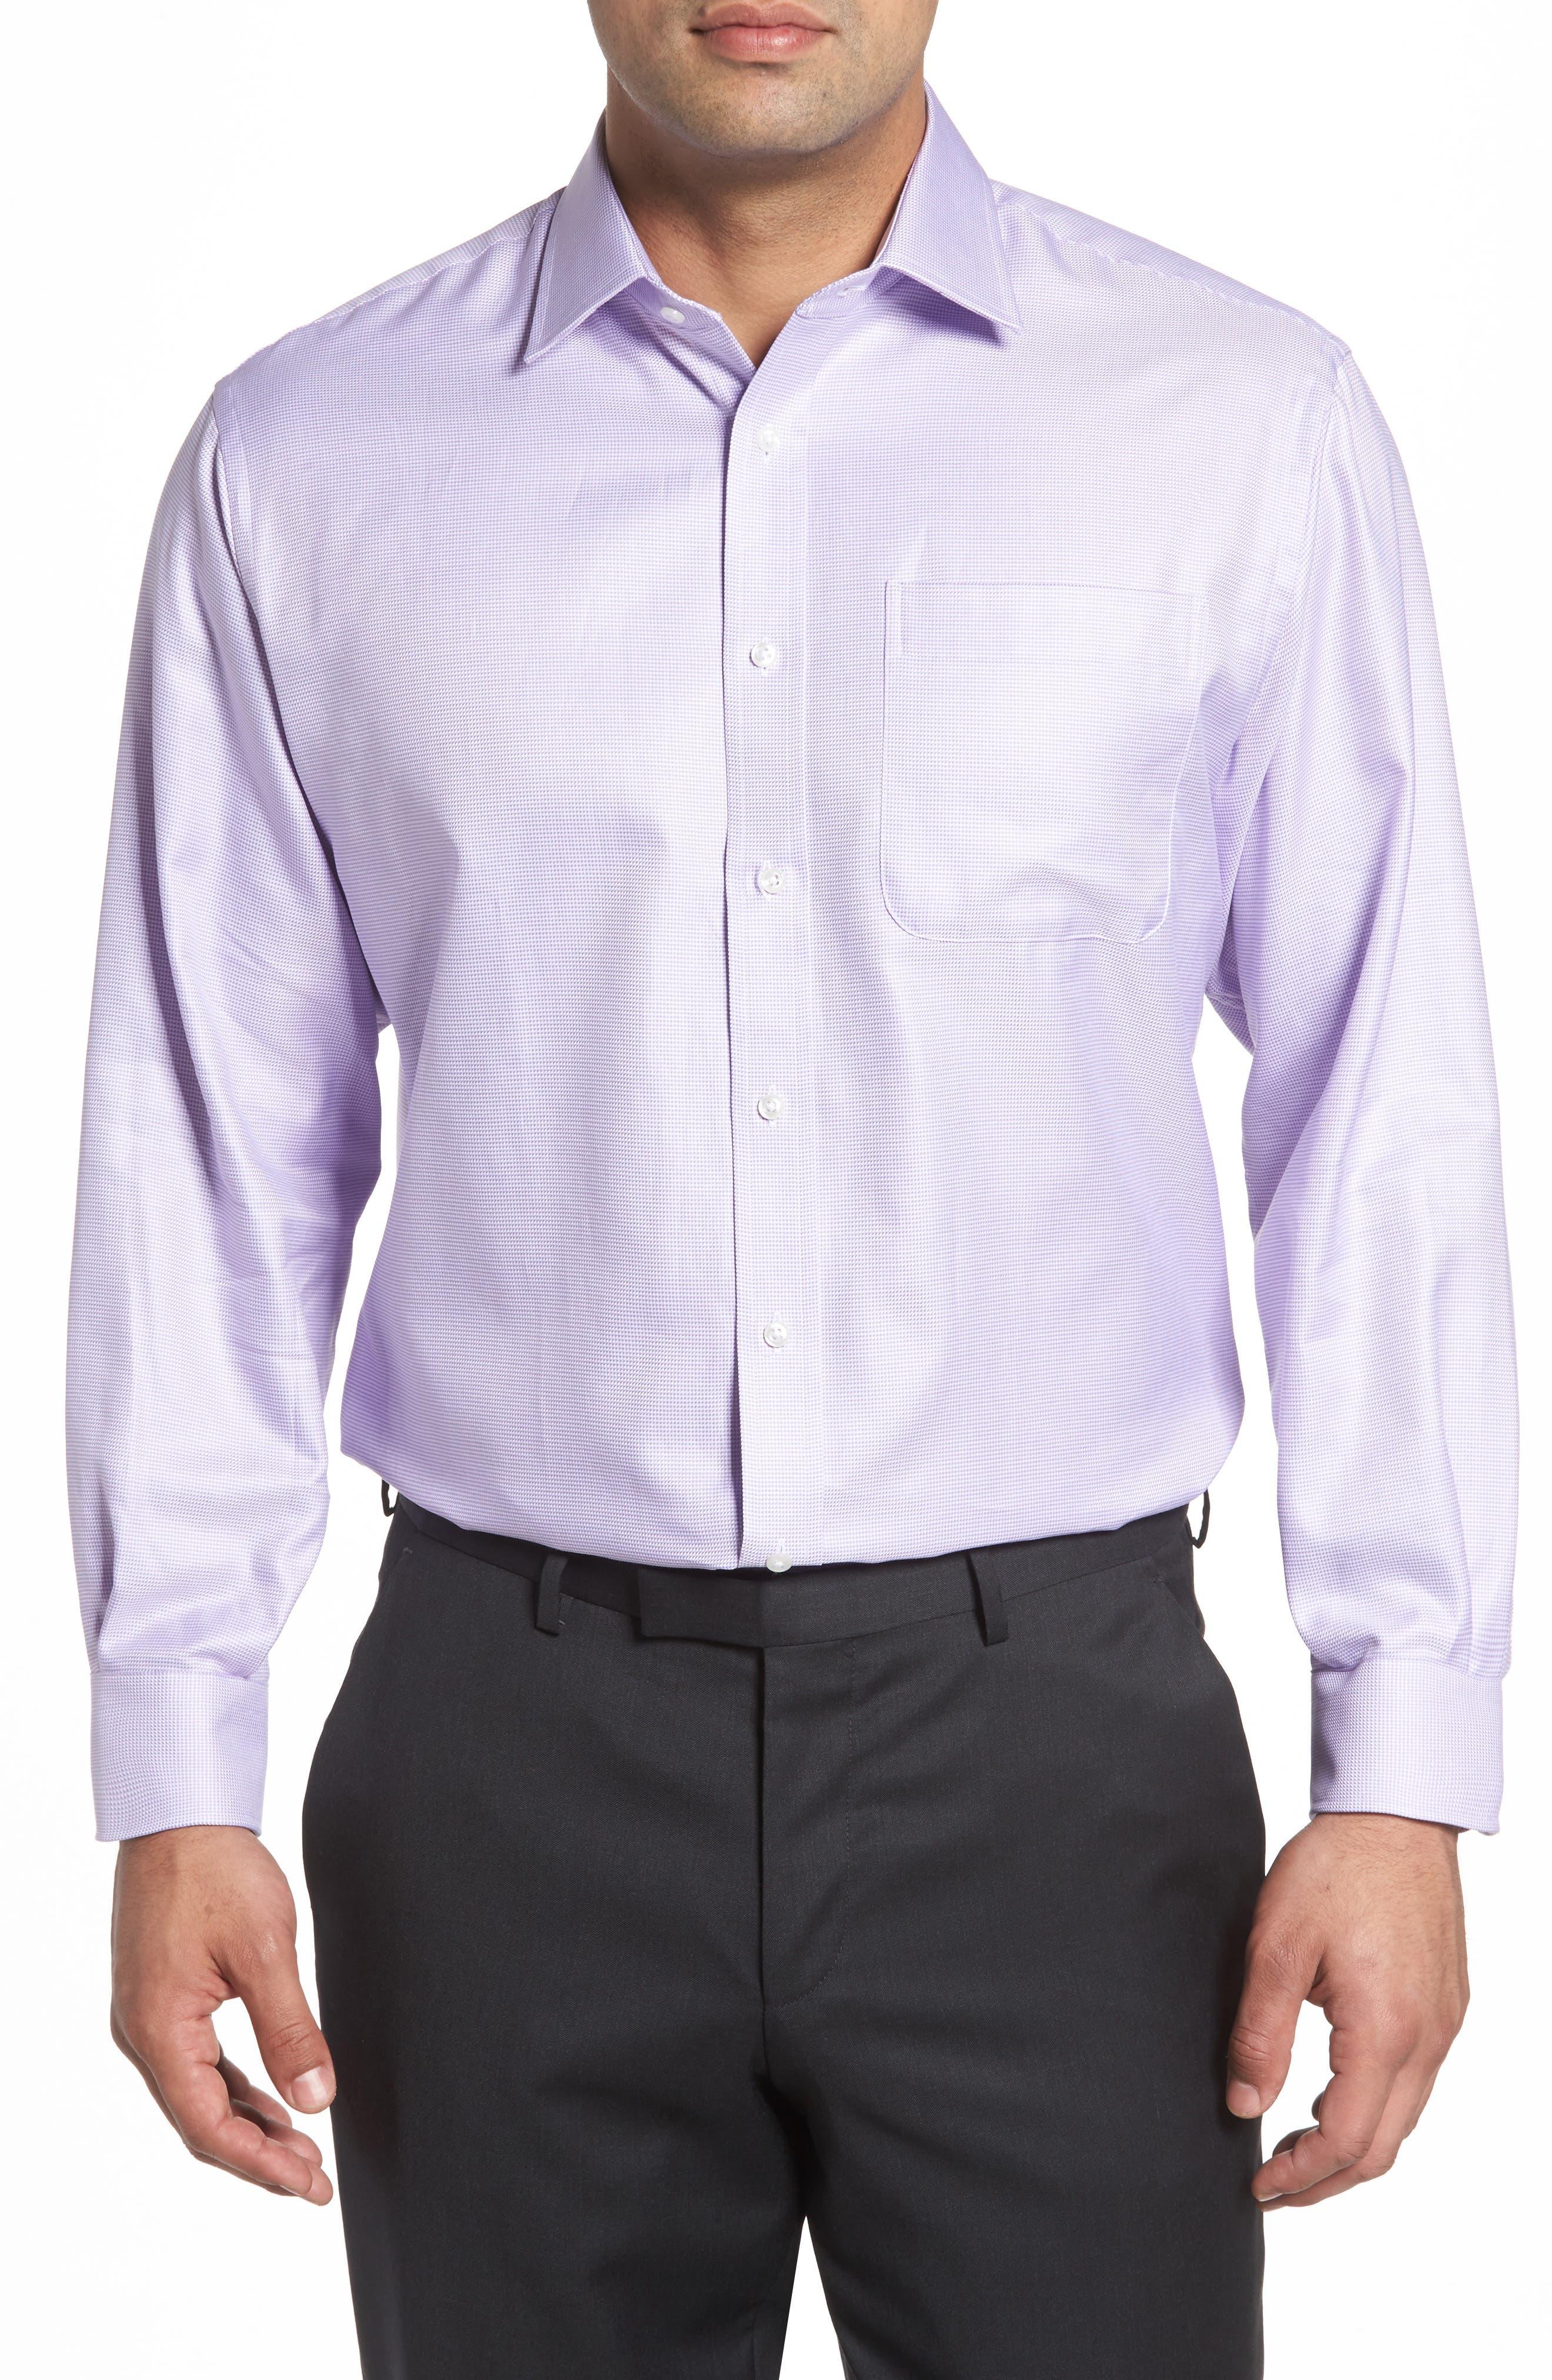 Nordstrom Men's Shop Classic Fit Microgrid Dress Shirt